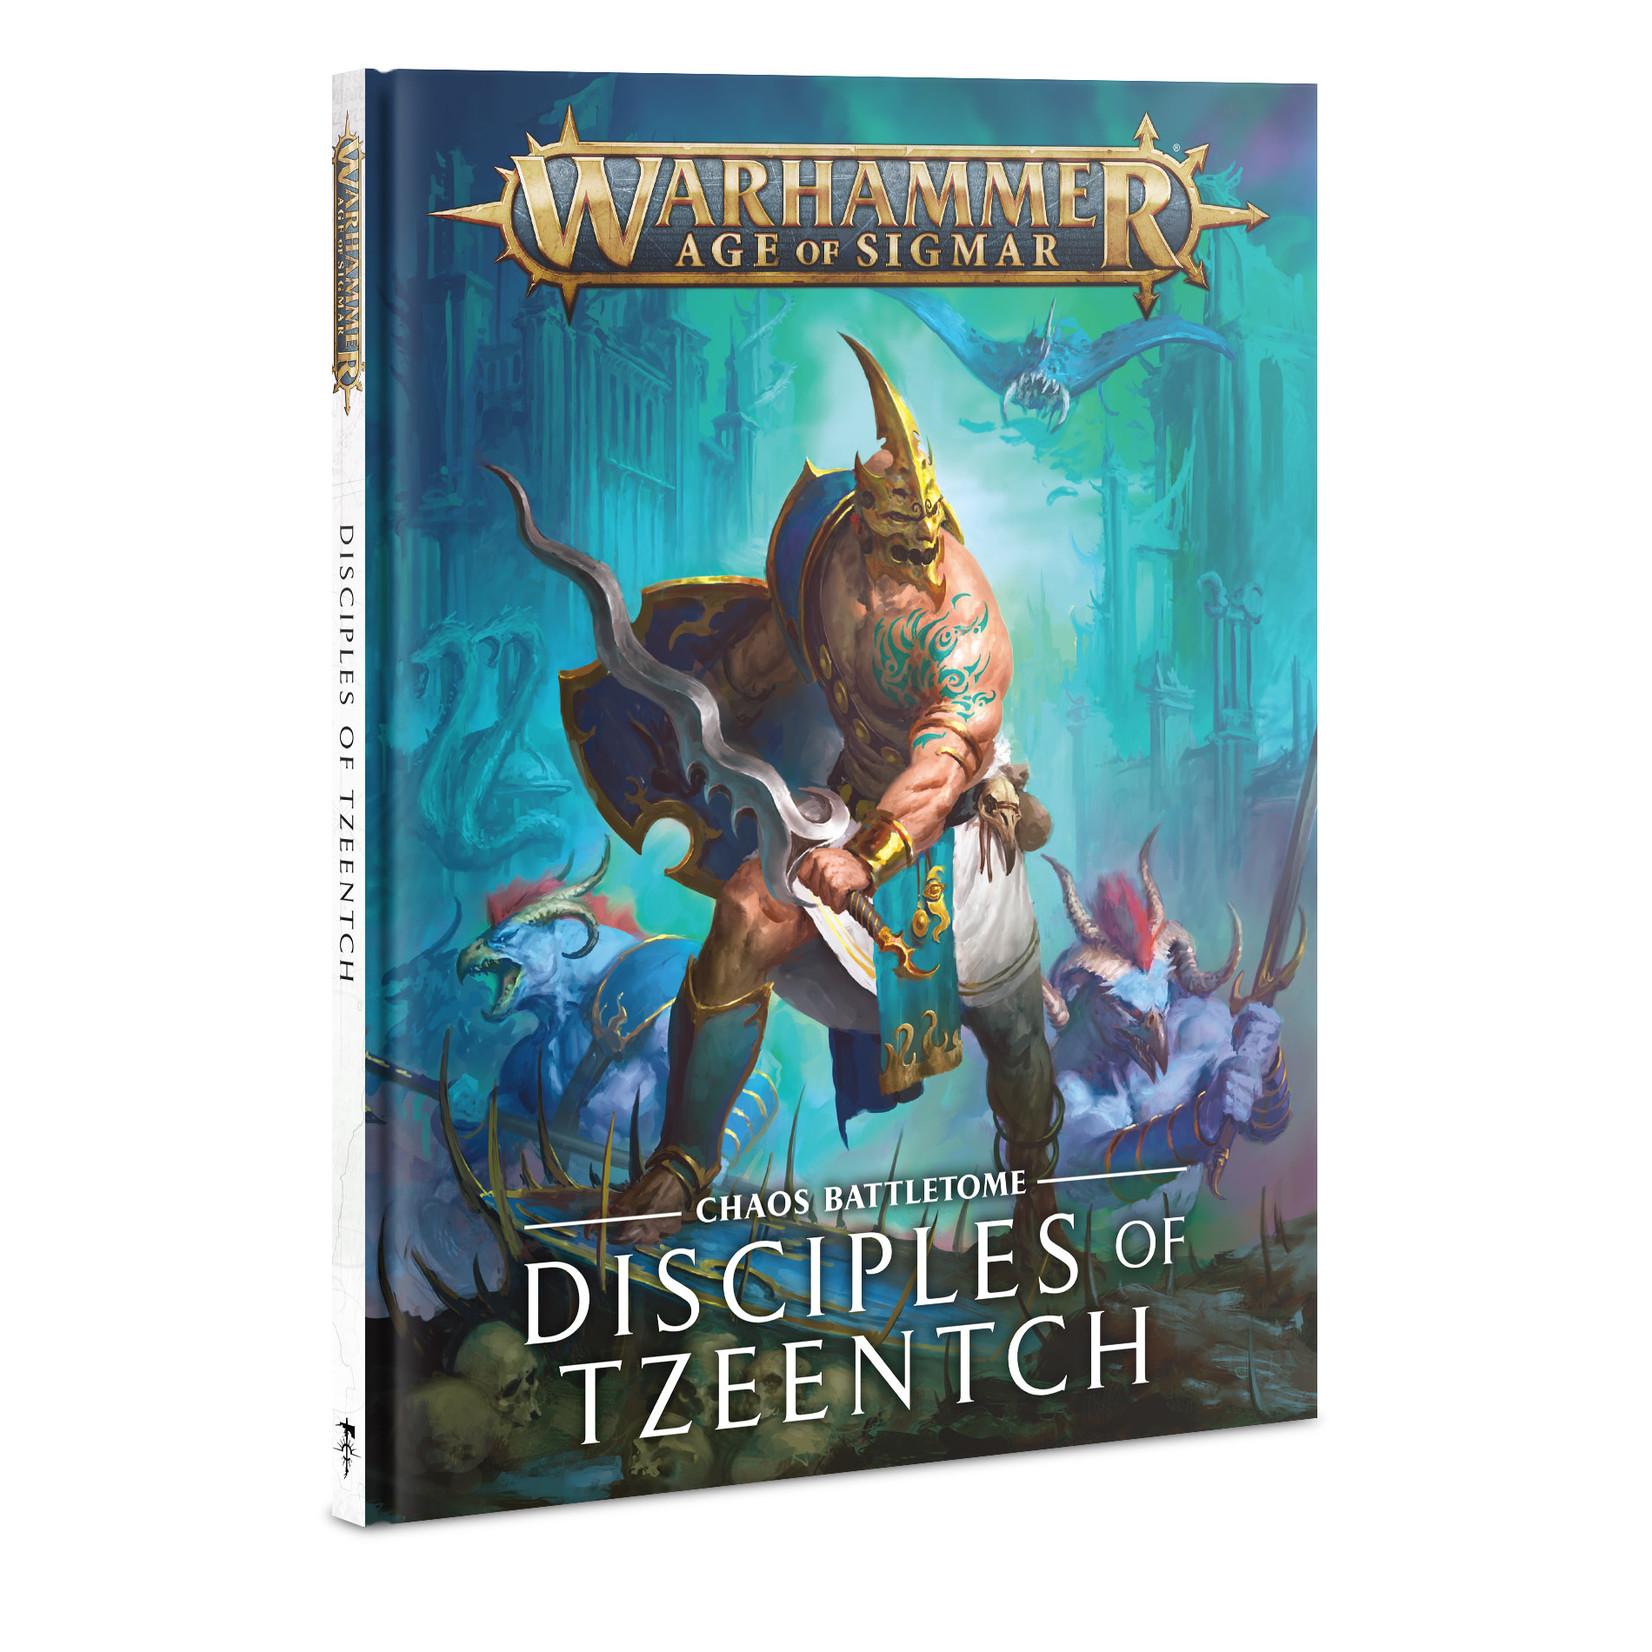 Games Workshop Warhammer Age of Sigmar: Battletome - Disciples of Tzeentch